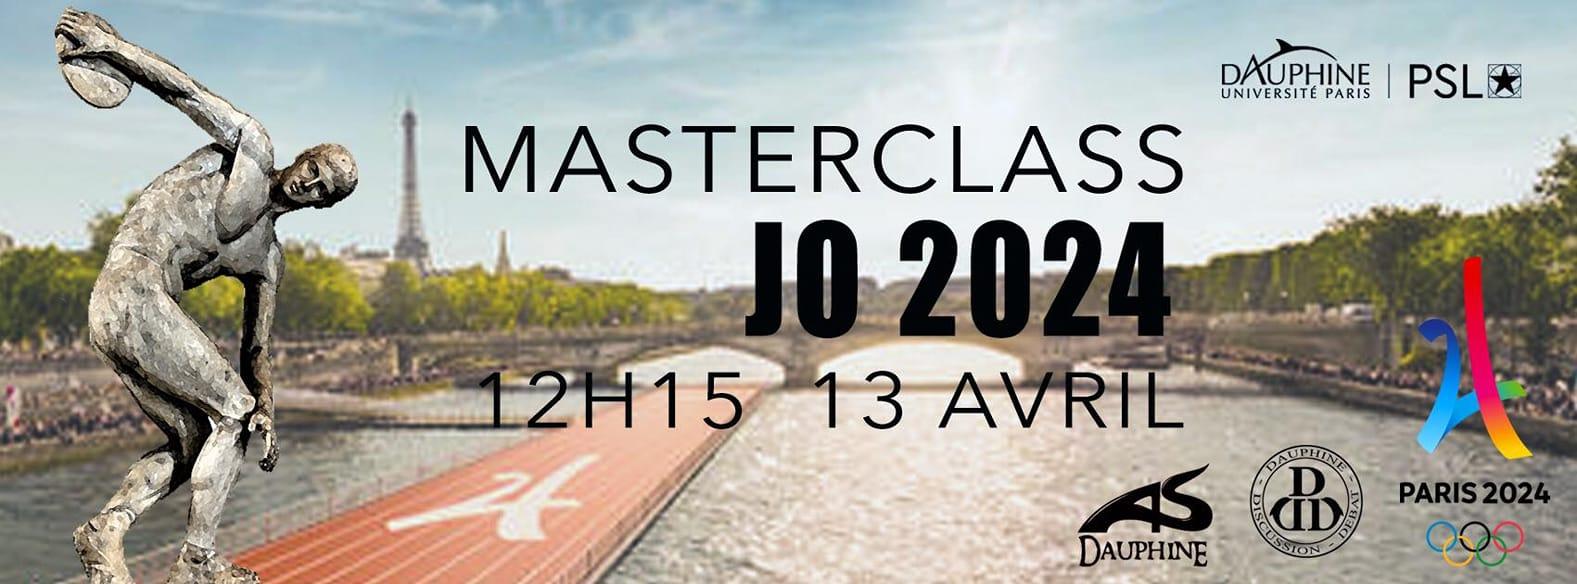 JO 2024